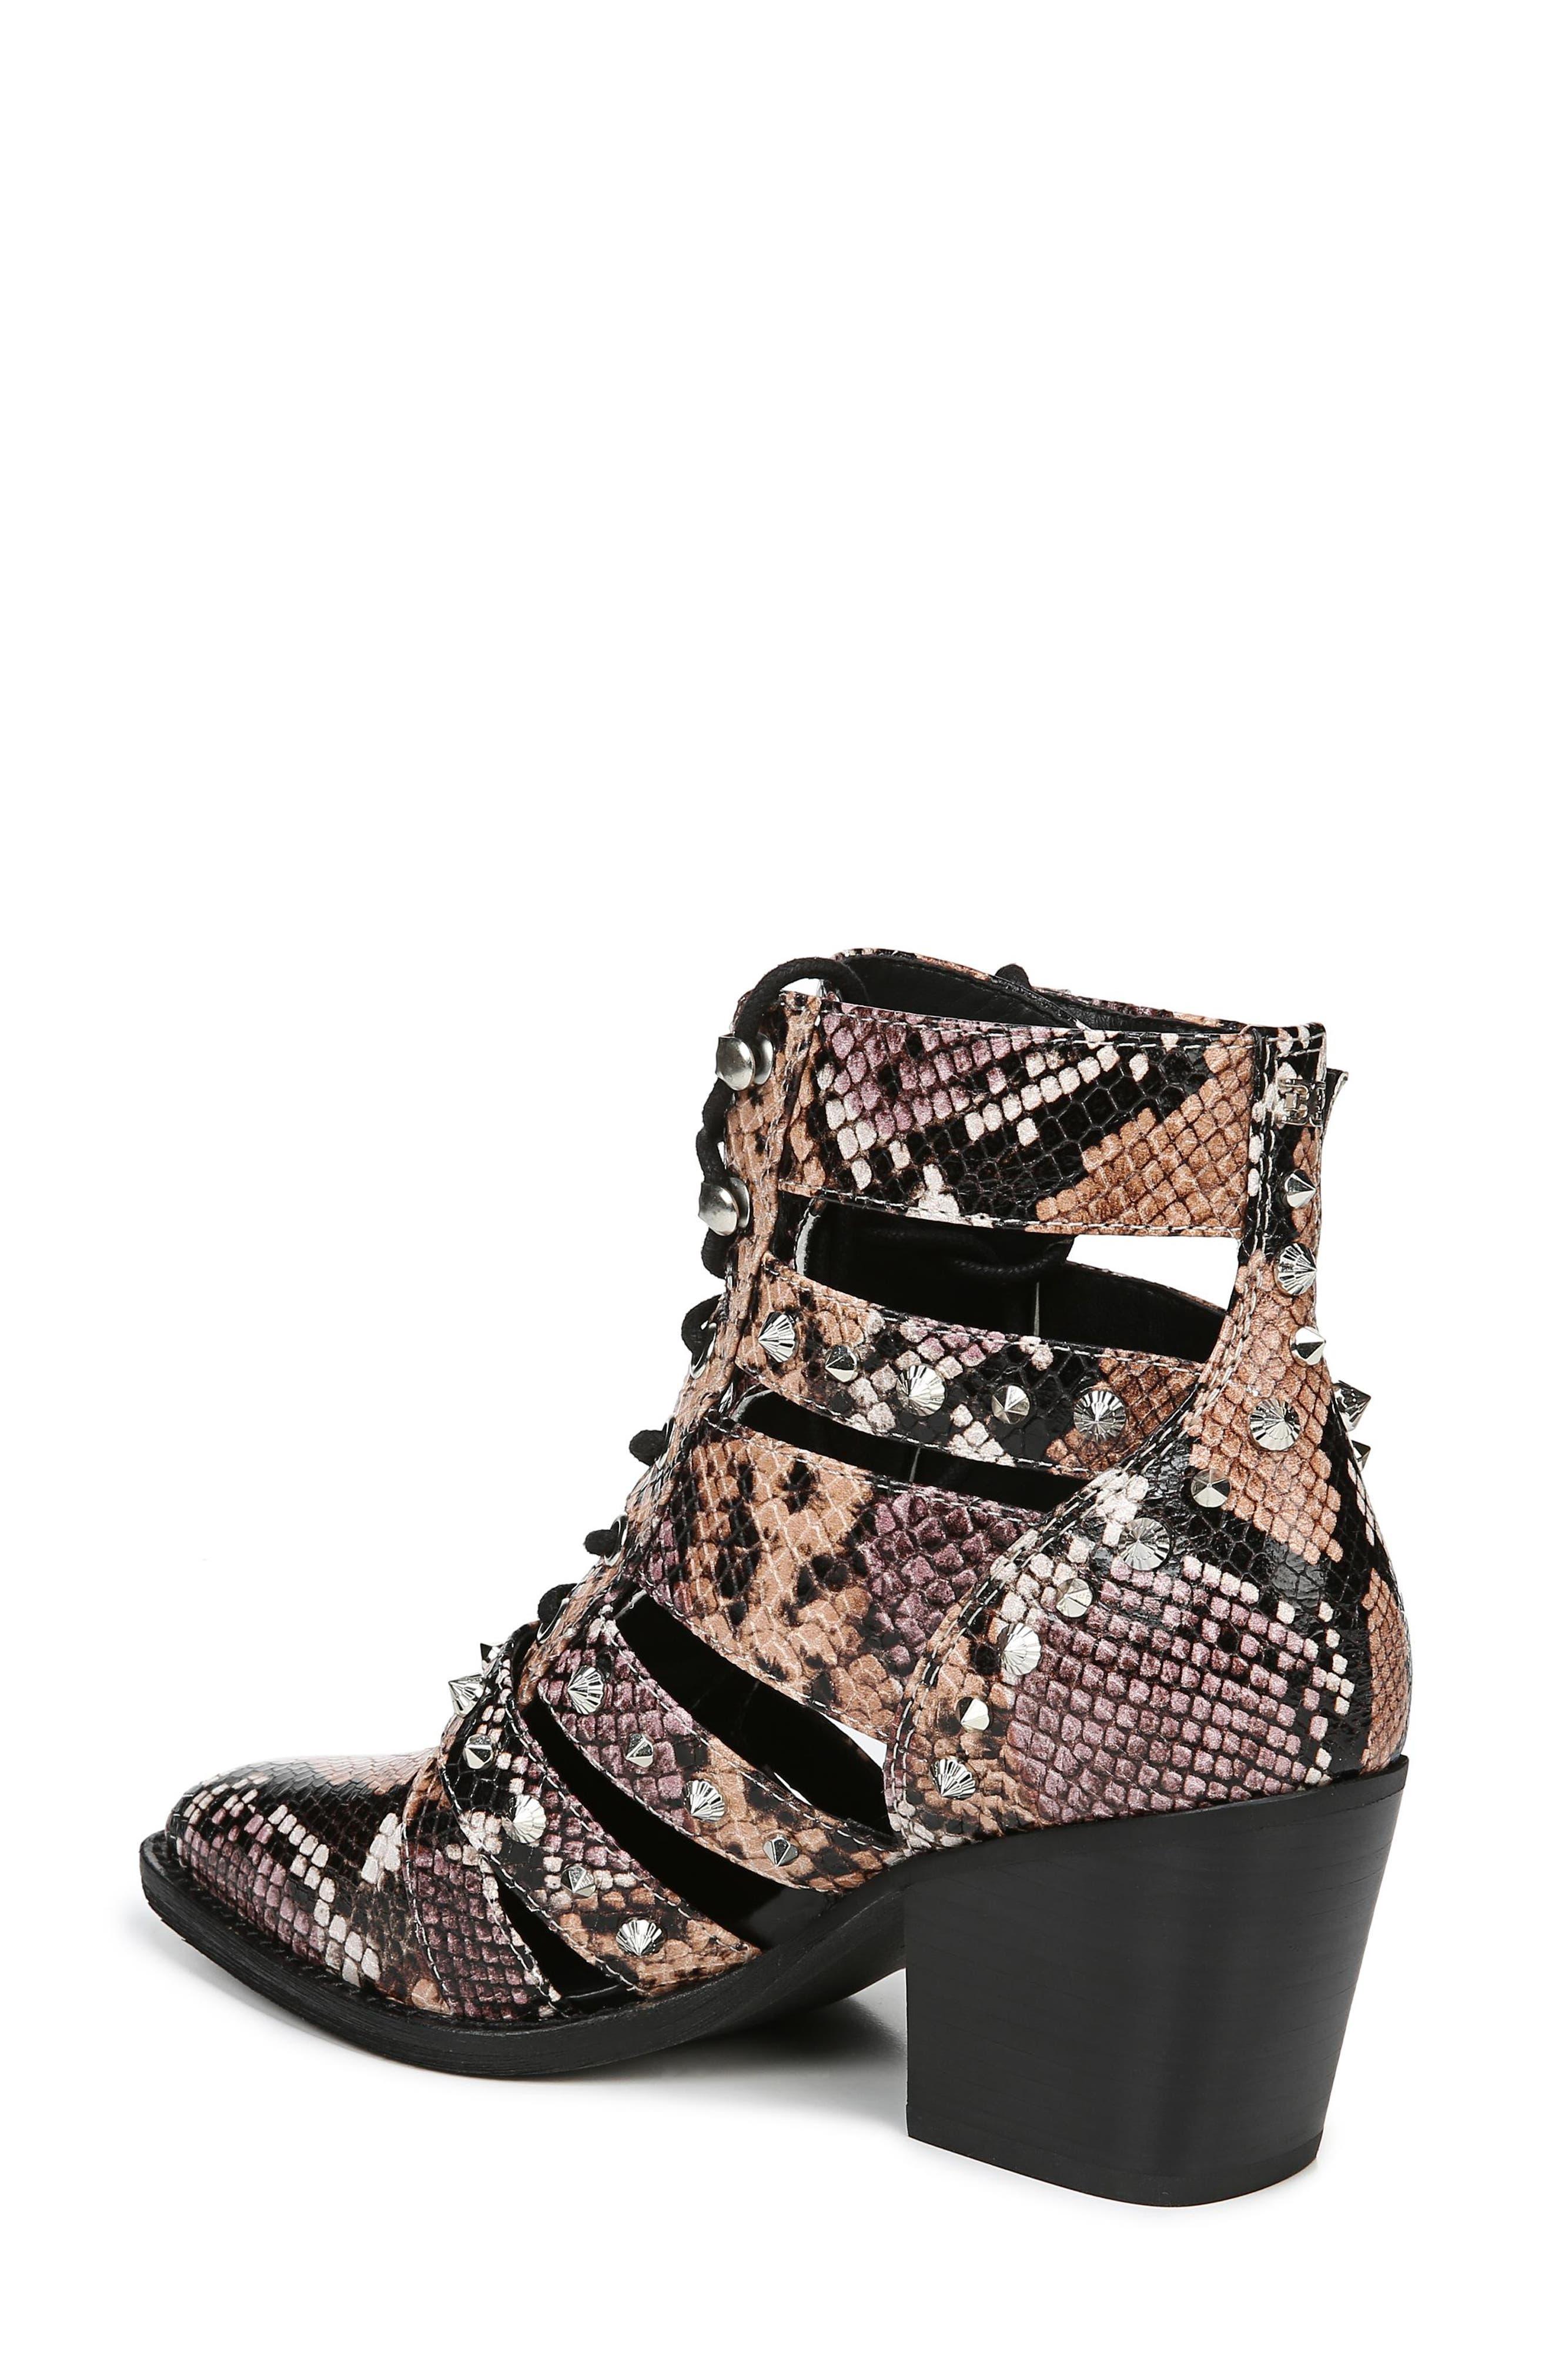 59ff4a3ea Women s Sam Edelman Booties   Ankle Boots